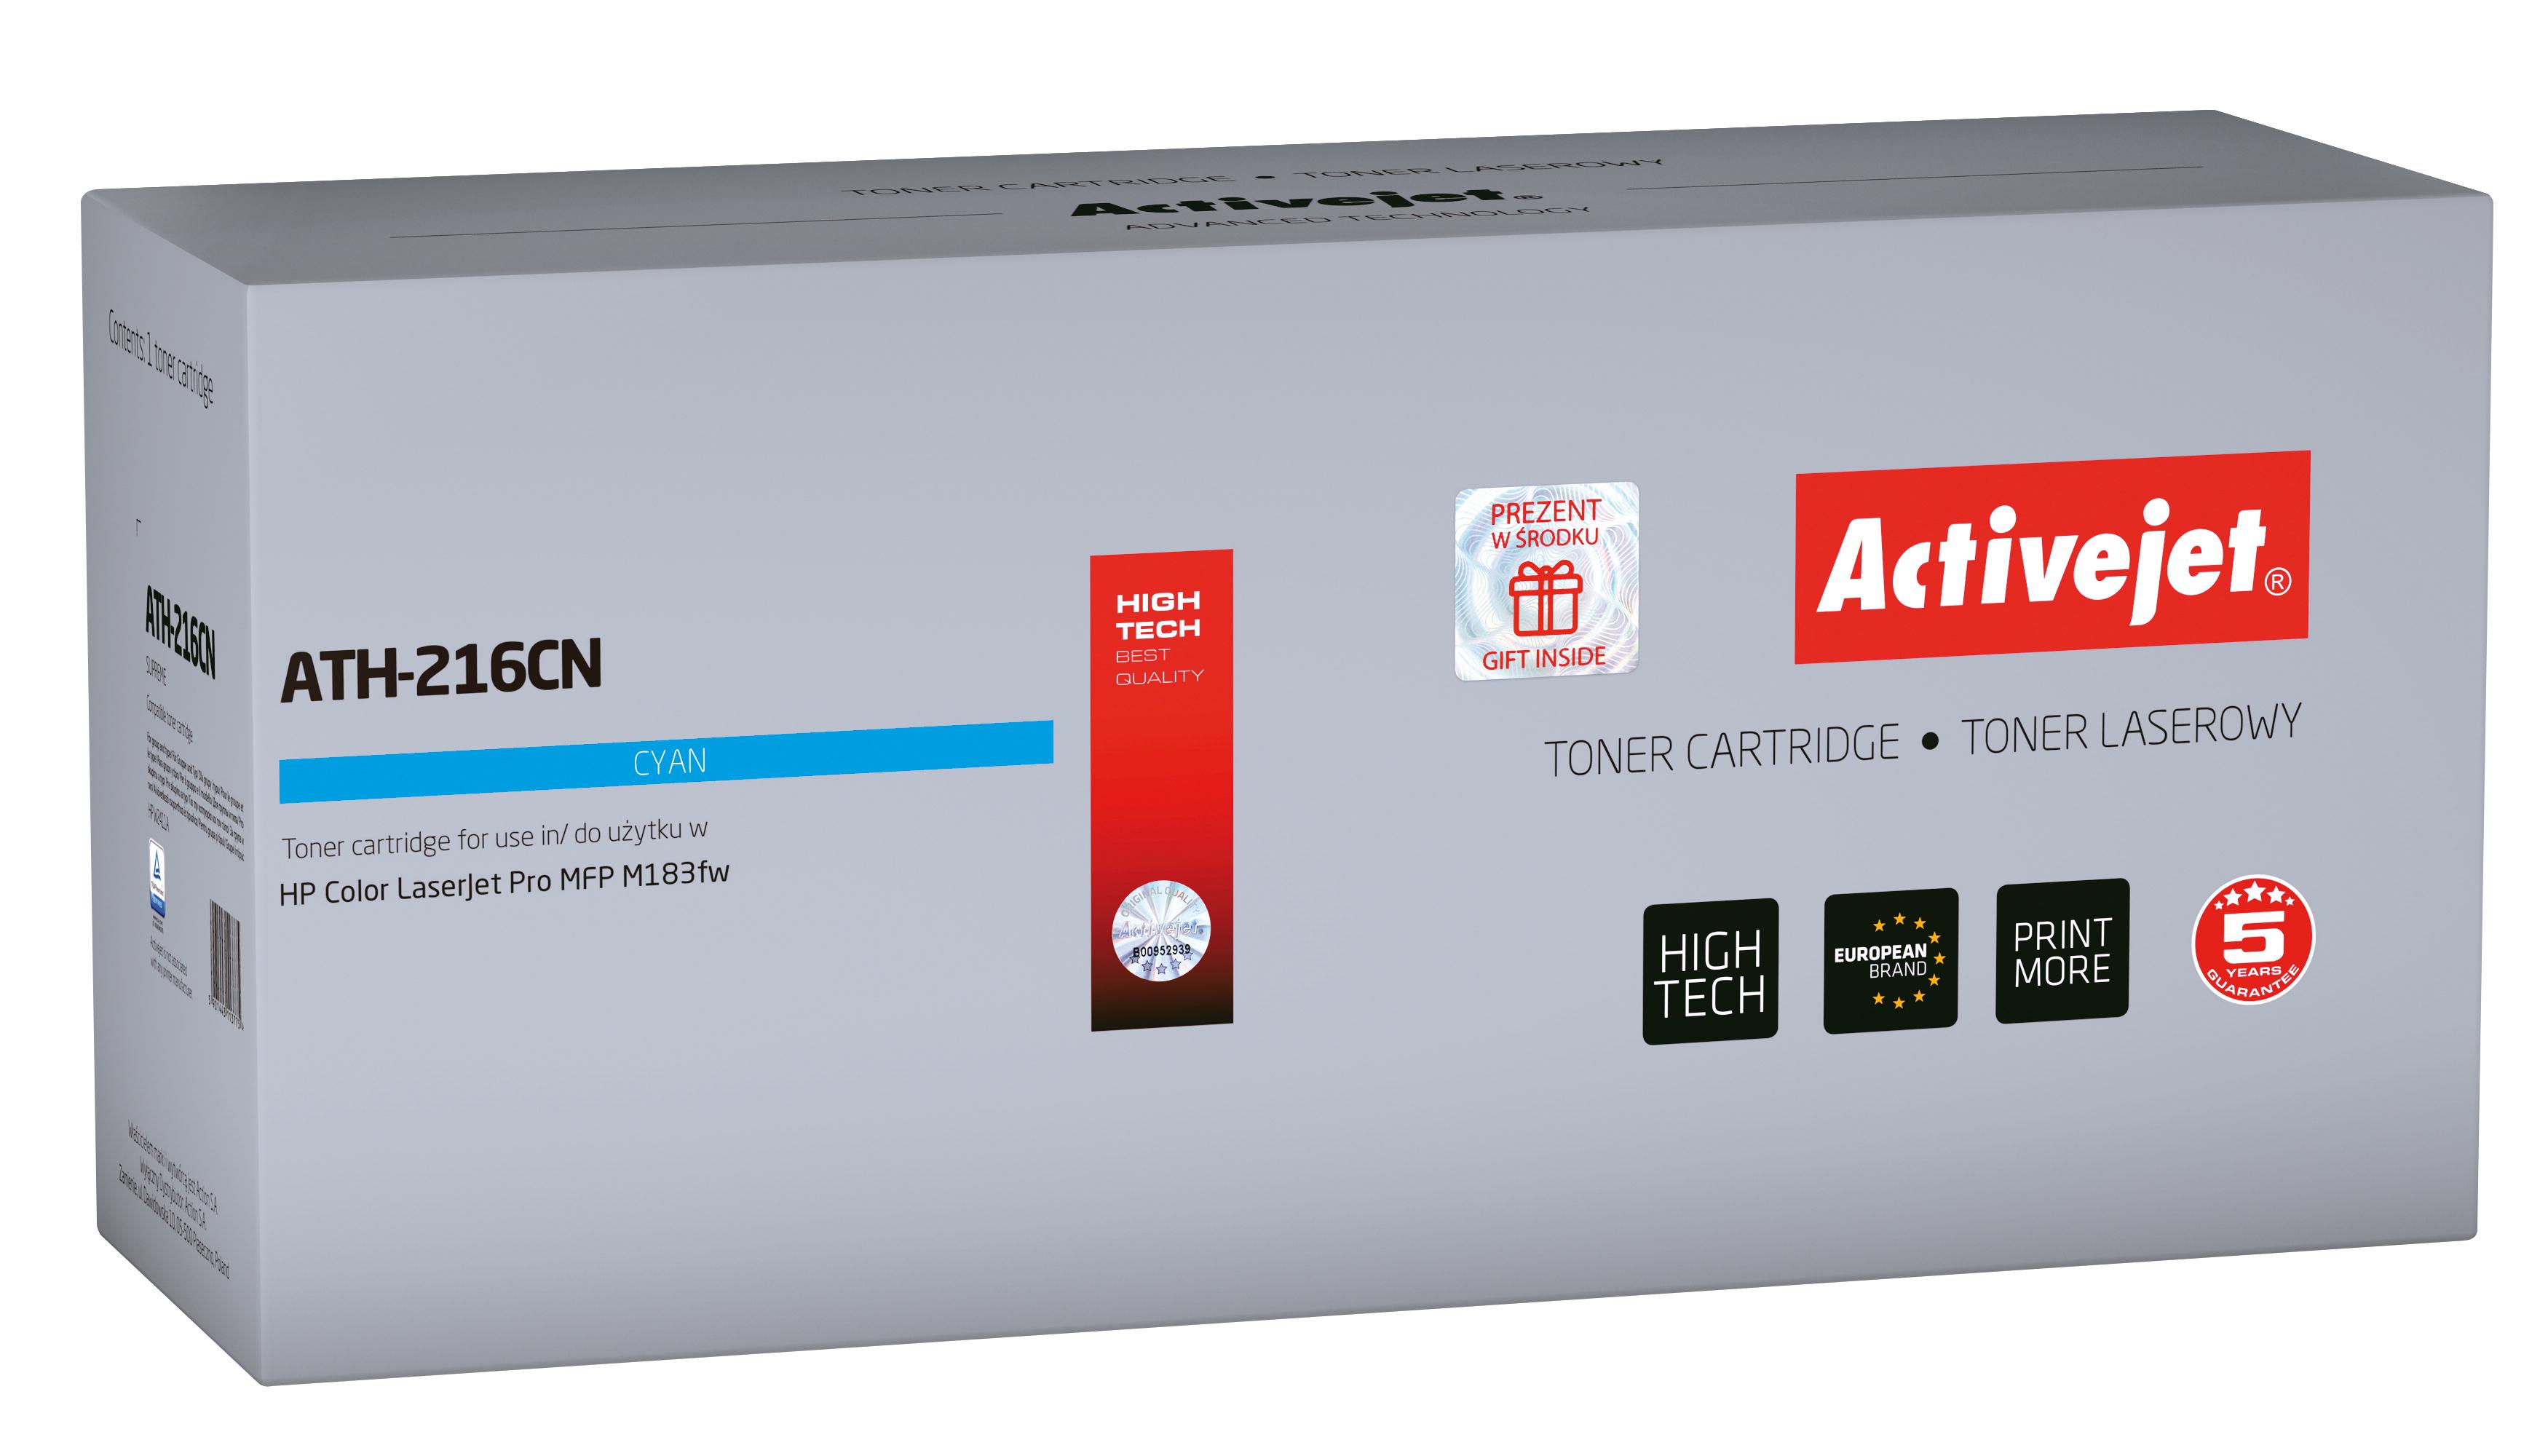 Toner Activejet  ATH-216CN do drukarki HP, Zamiennik HP 216A W2411A; Supreme; 850 stron; Błękitny. Brak chipa